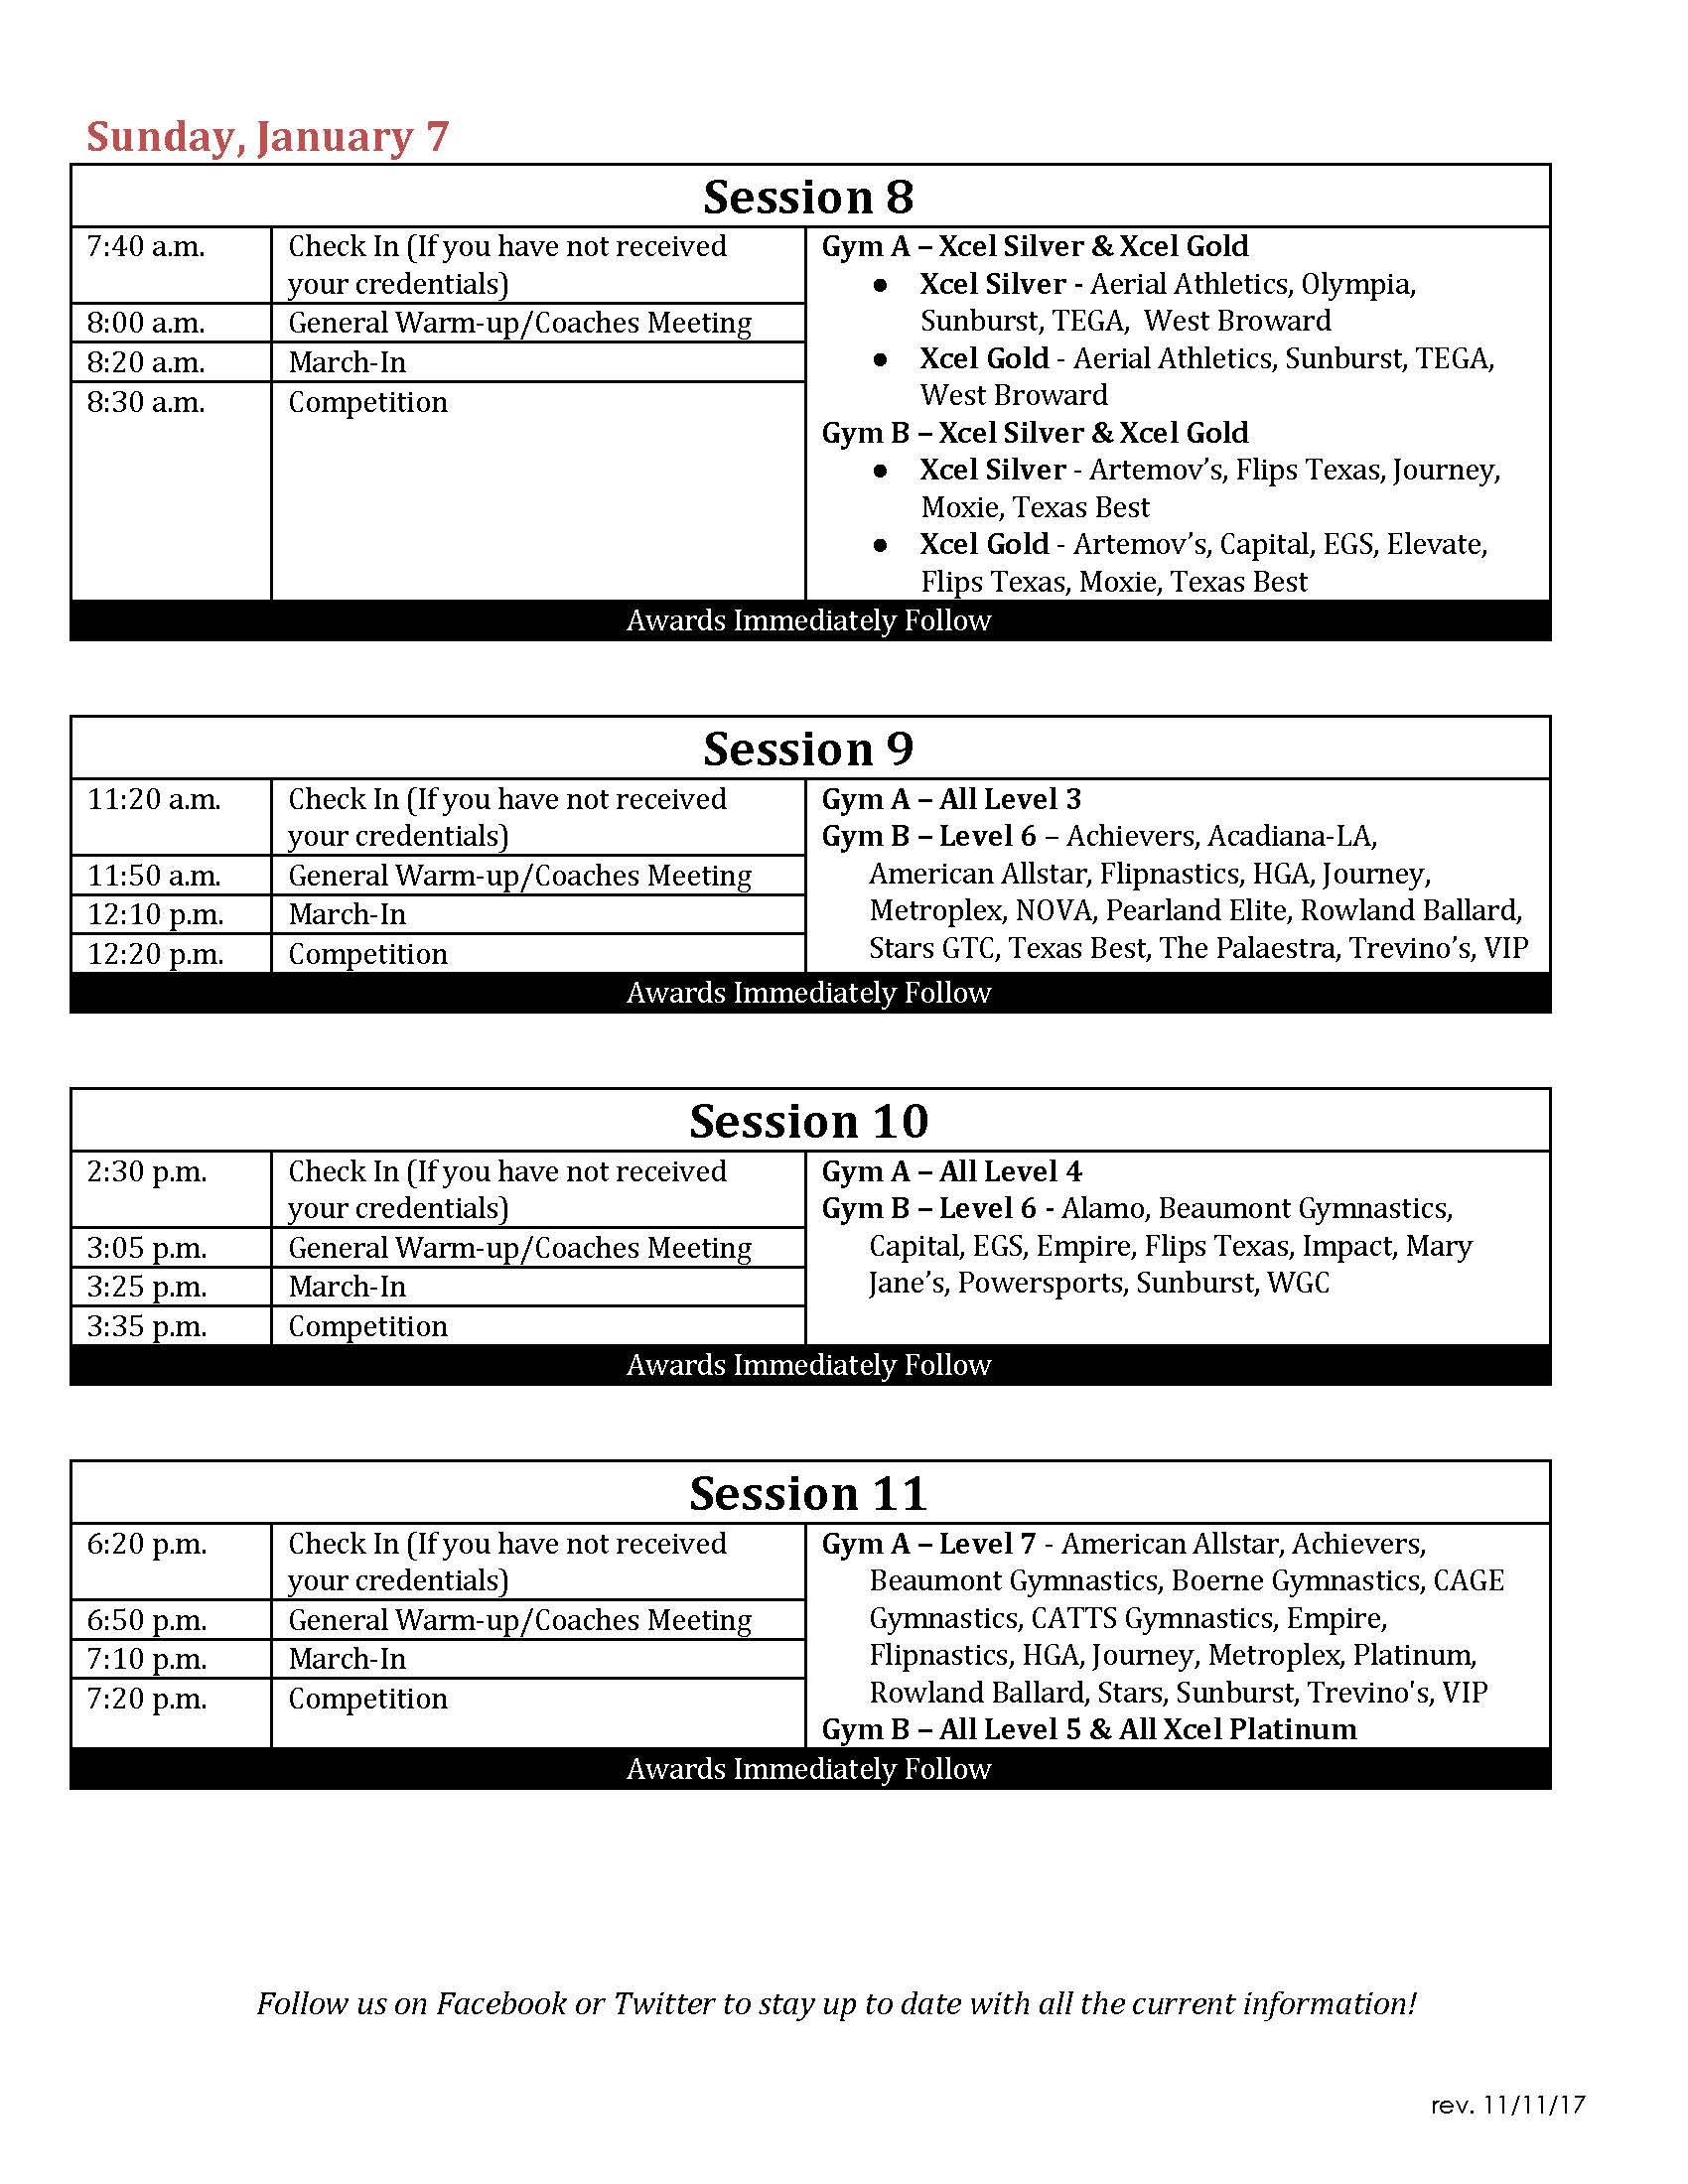 Alamo Classic 2018 Schedule JPG (rev. 11.11.17)_Page_3